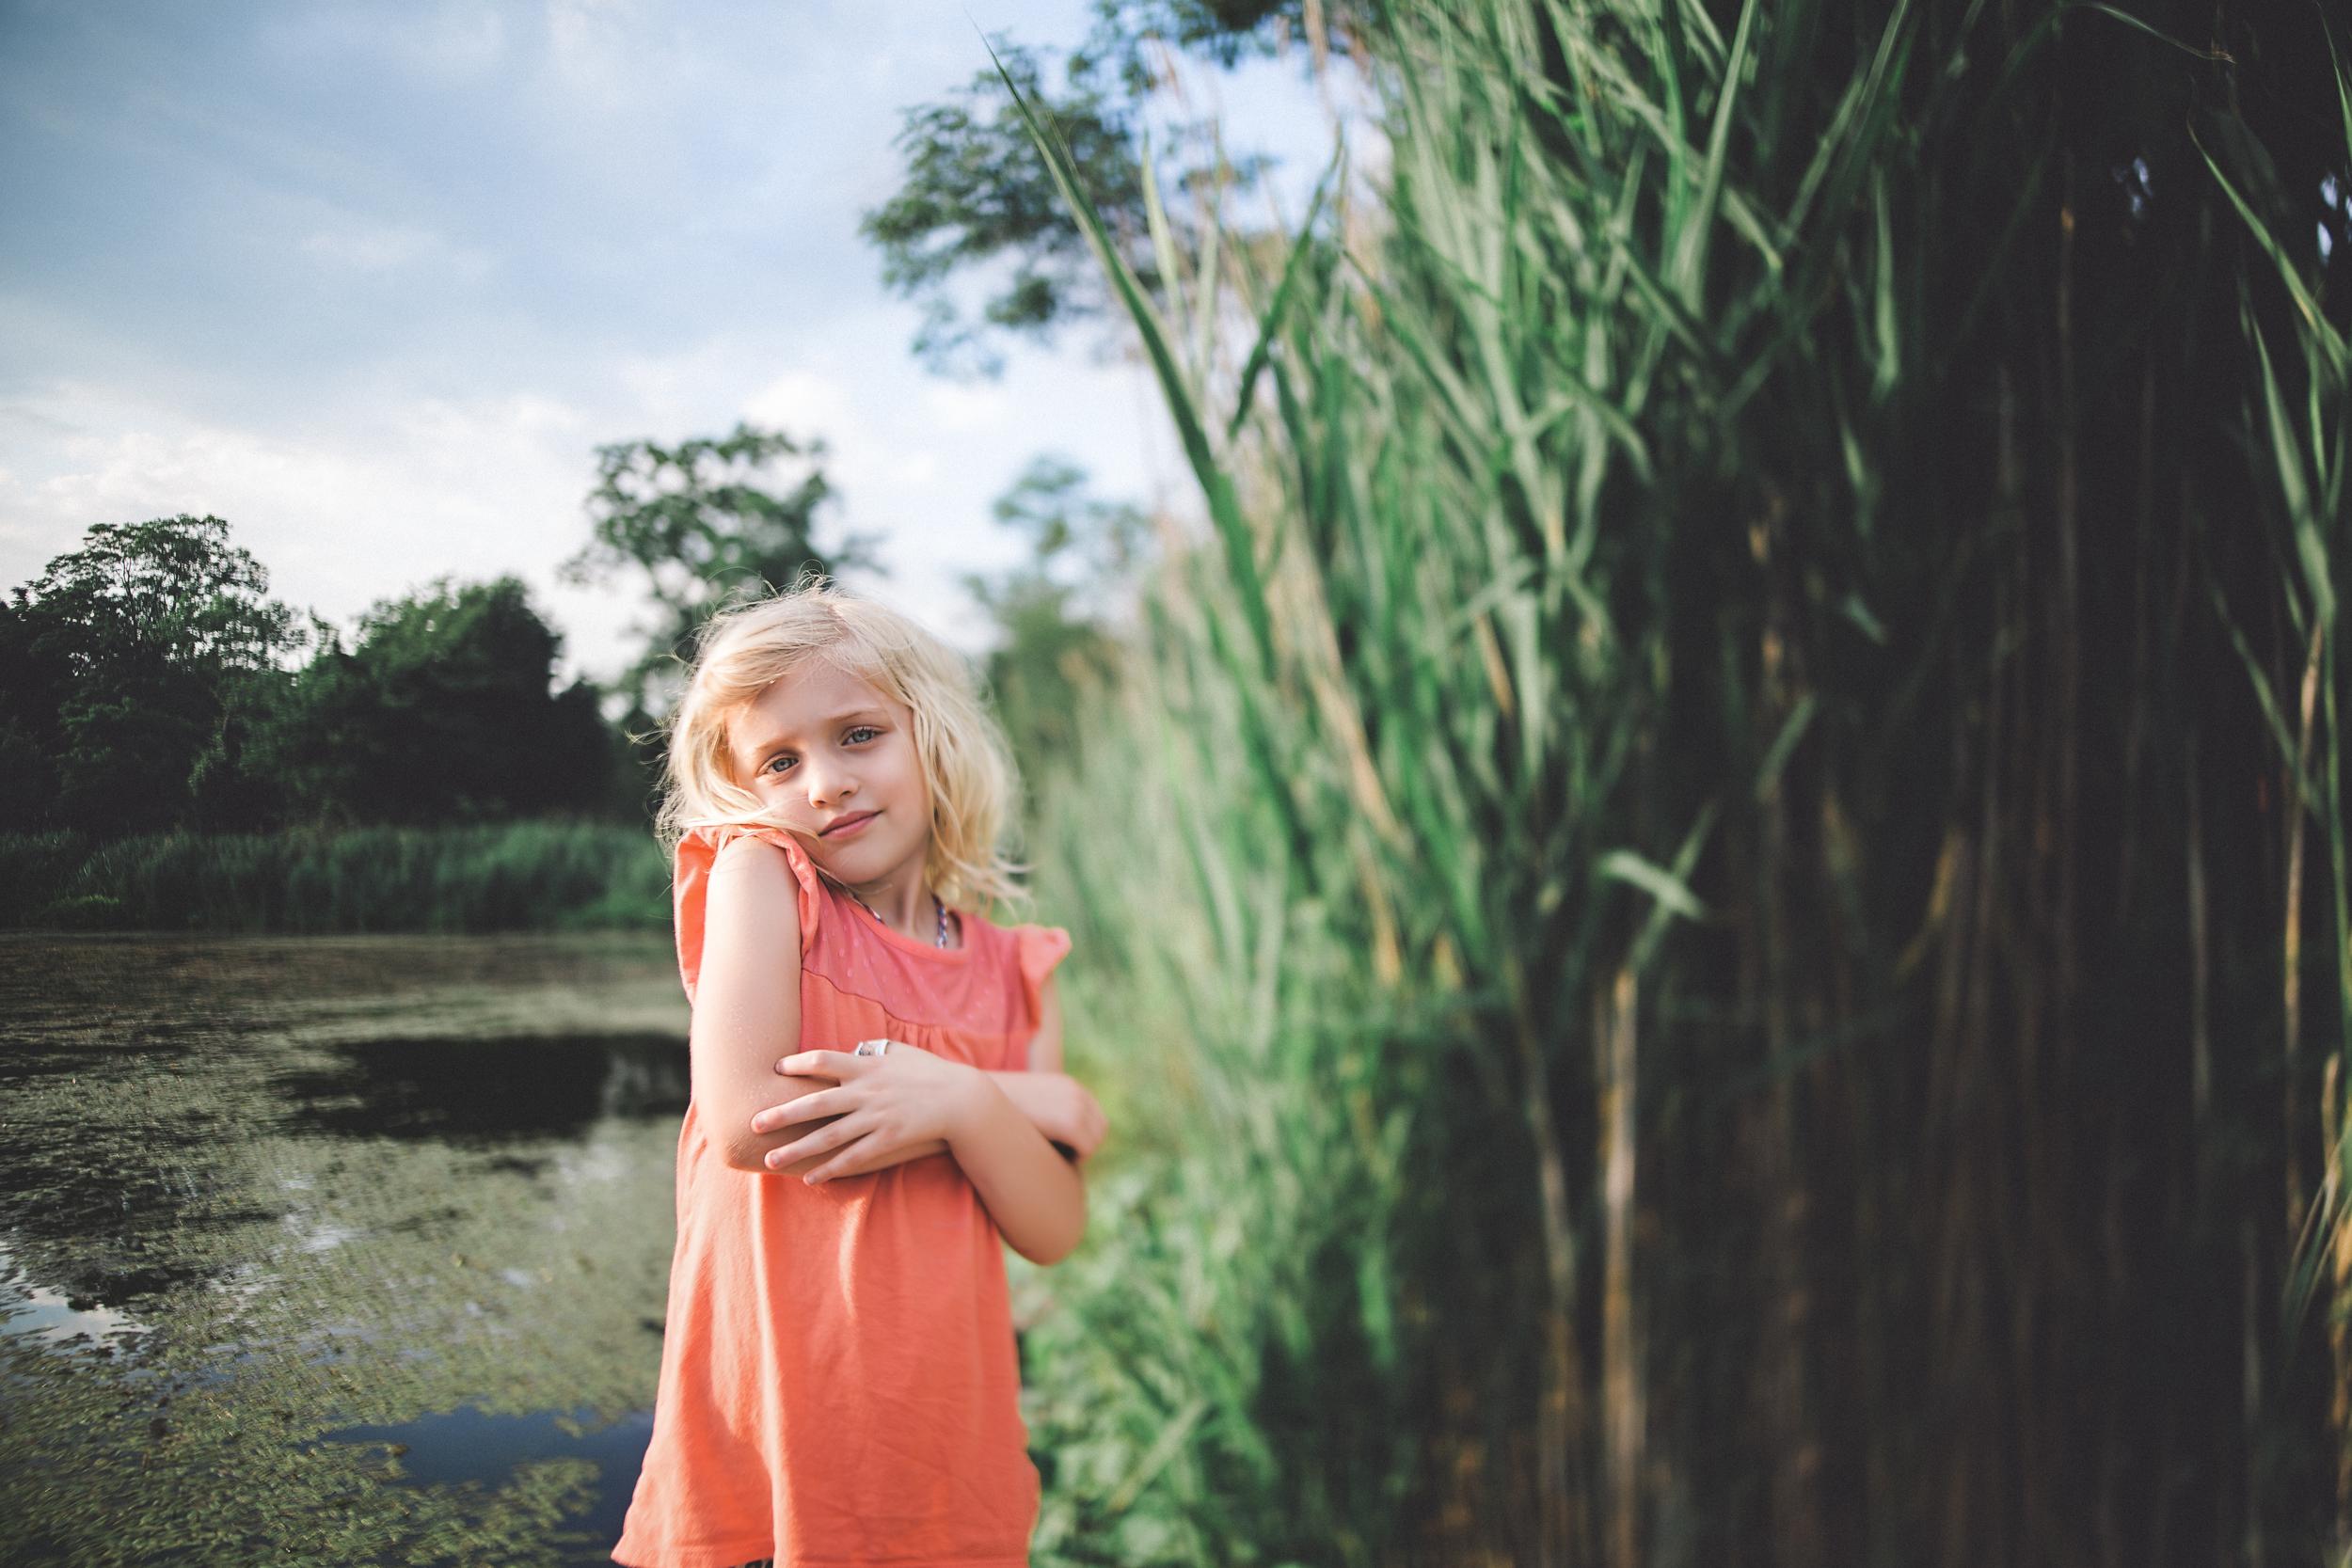 Hello-olivia-photography-long-lsland-family-children-documentary-photographer-childrens0freelens-carmen's-river